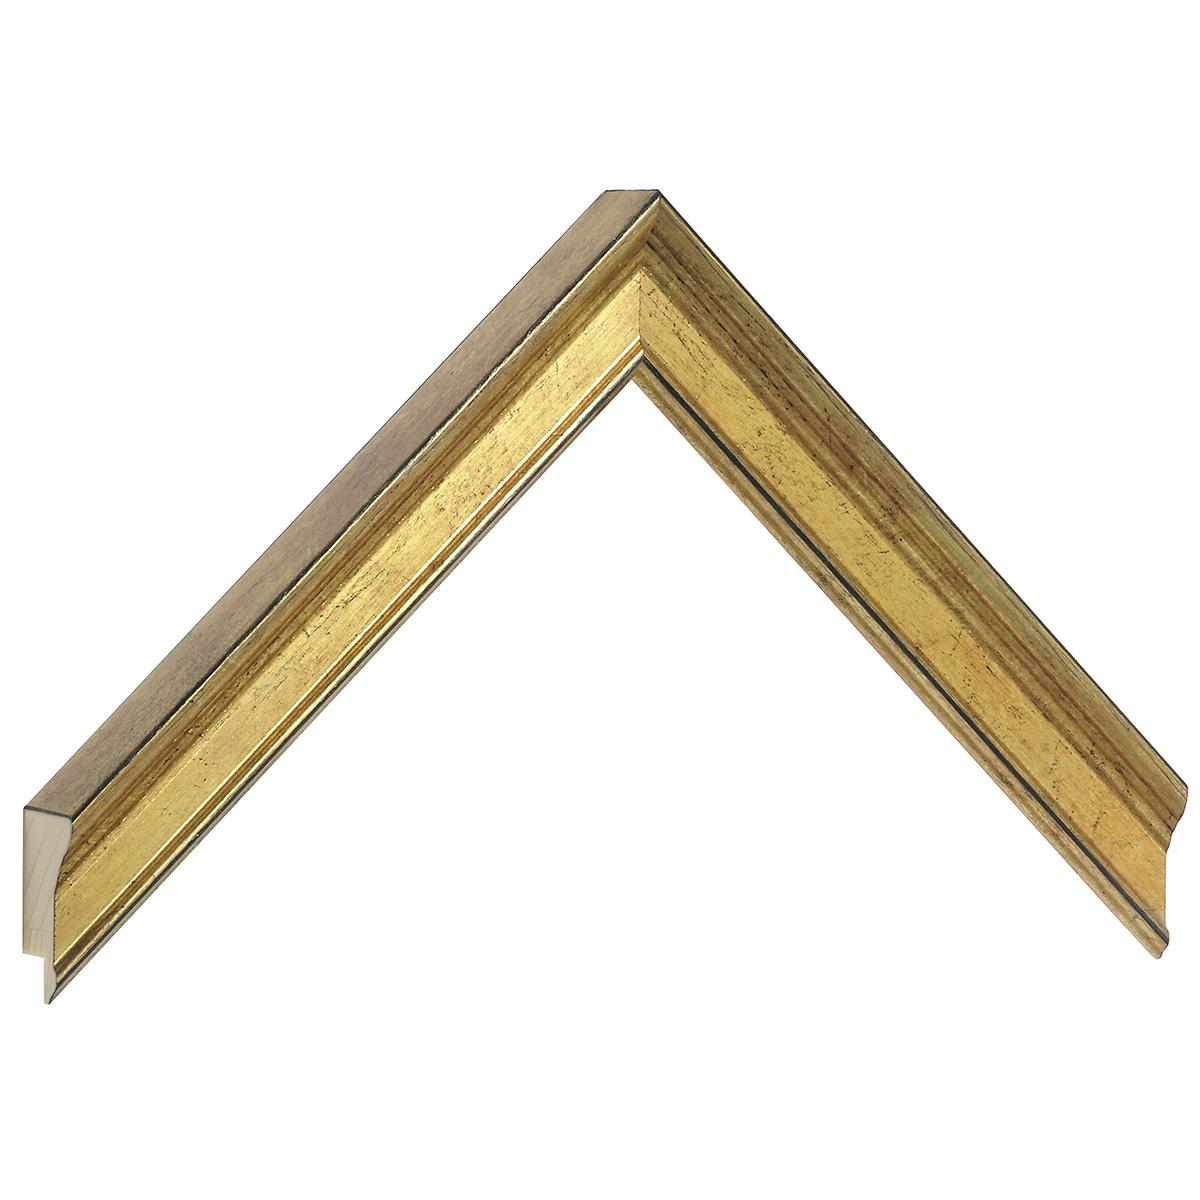 Moulding finger joint pine - width 23mm height 25 - golg